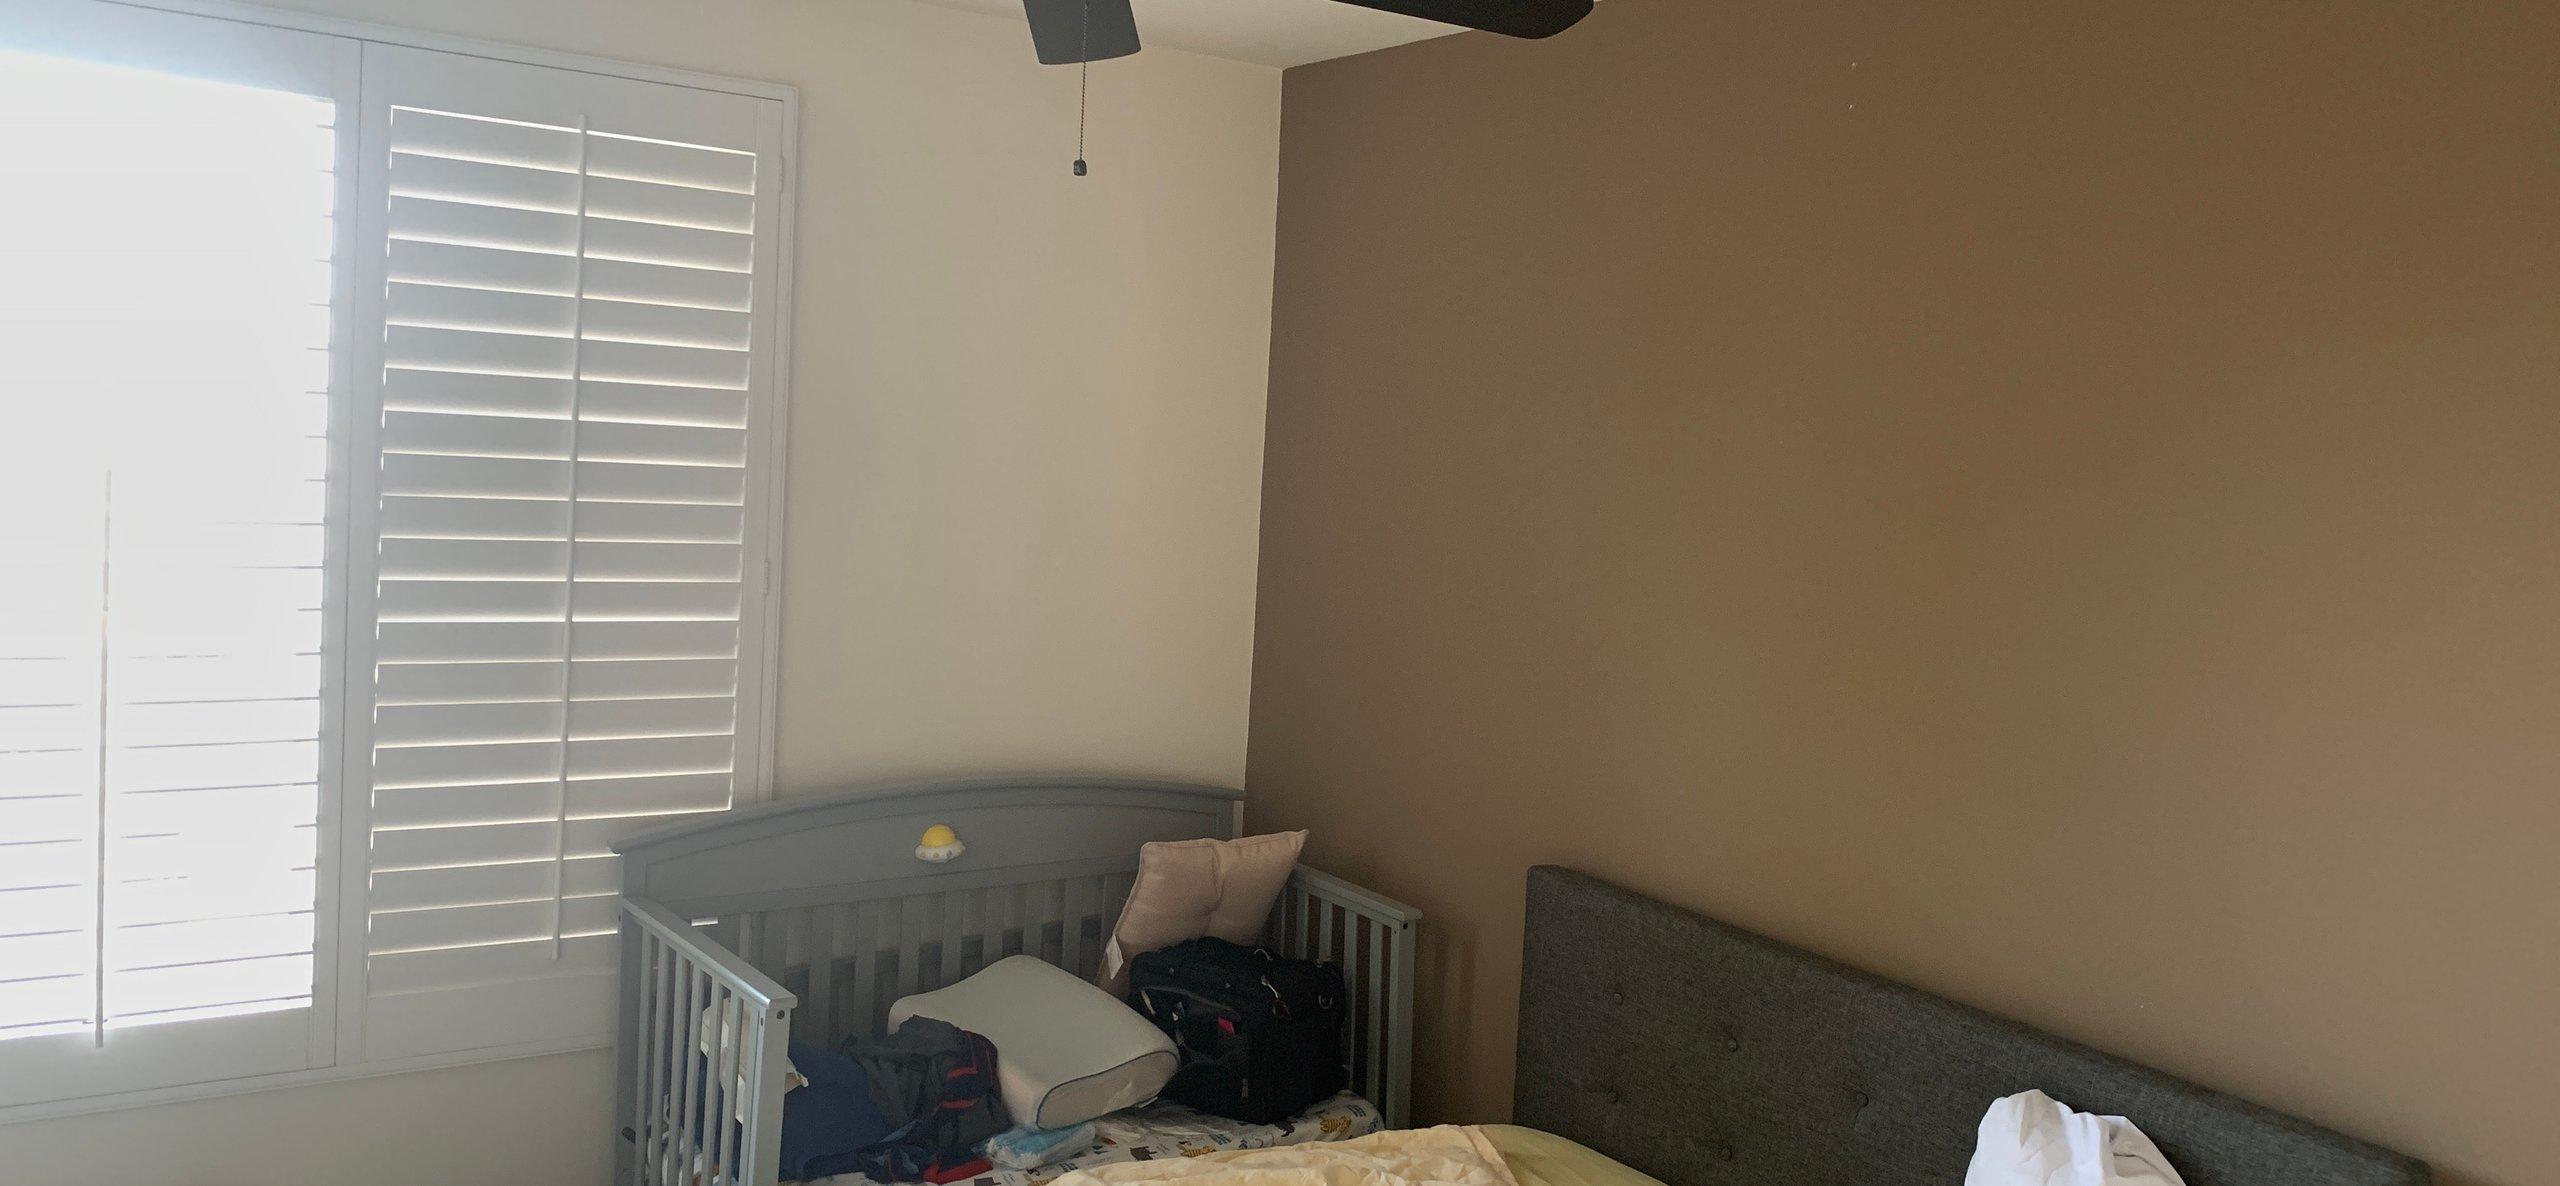 16x13 Bedroom self storage unit